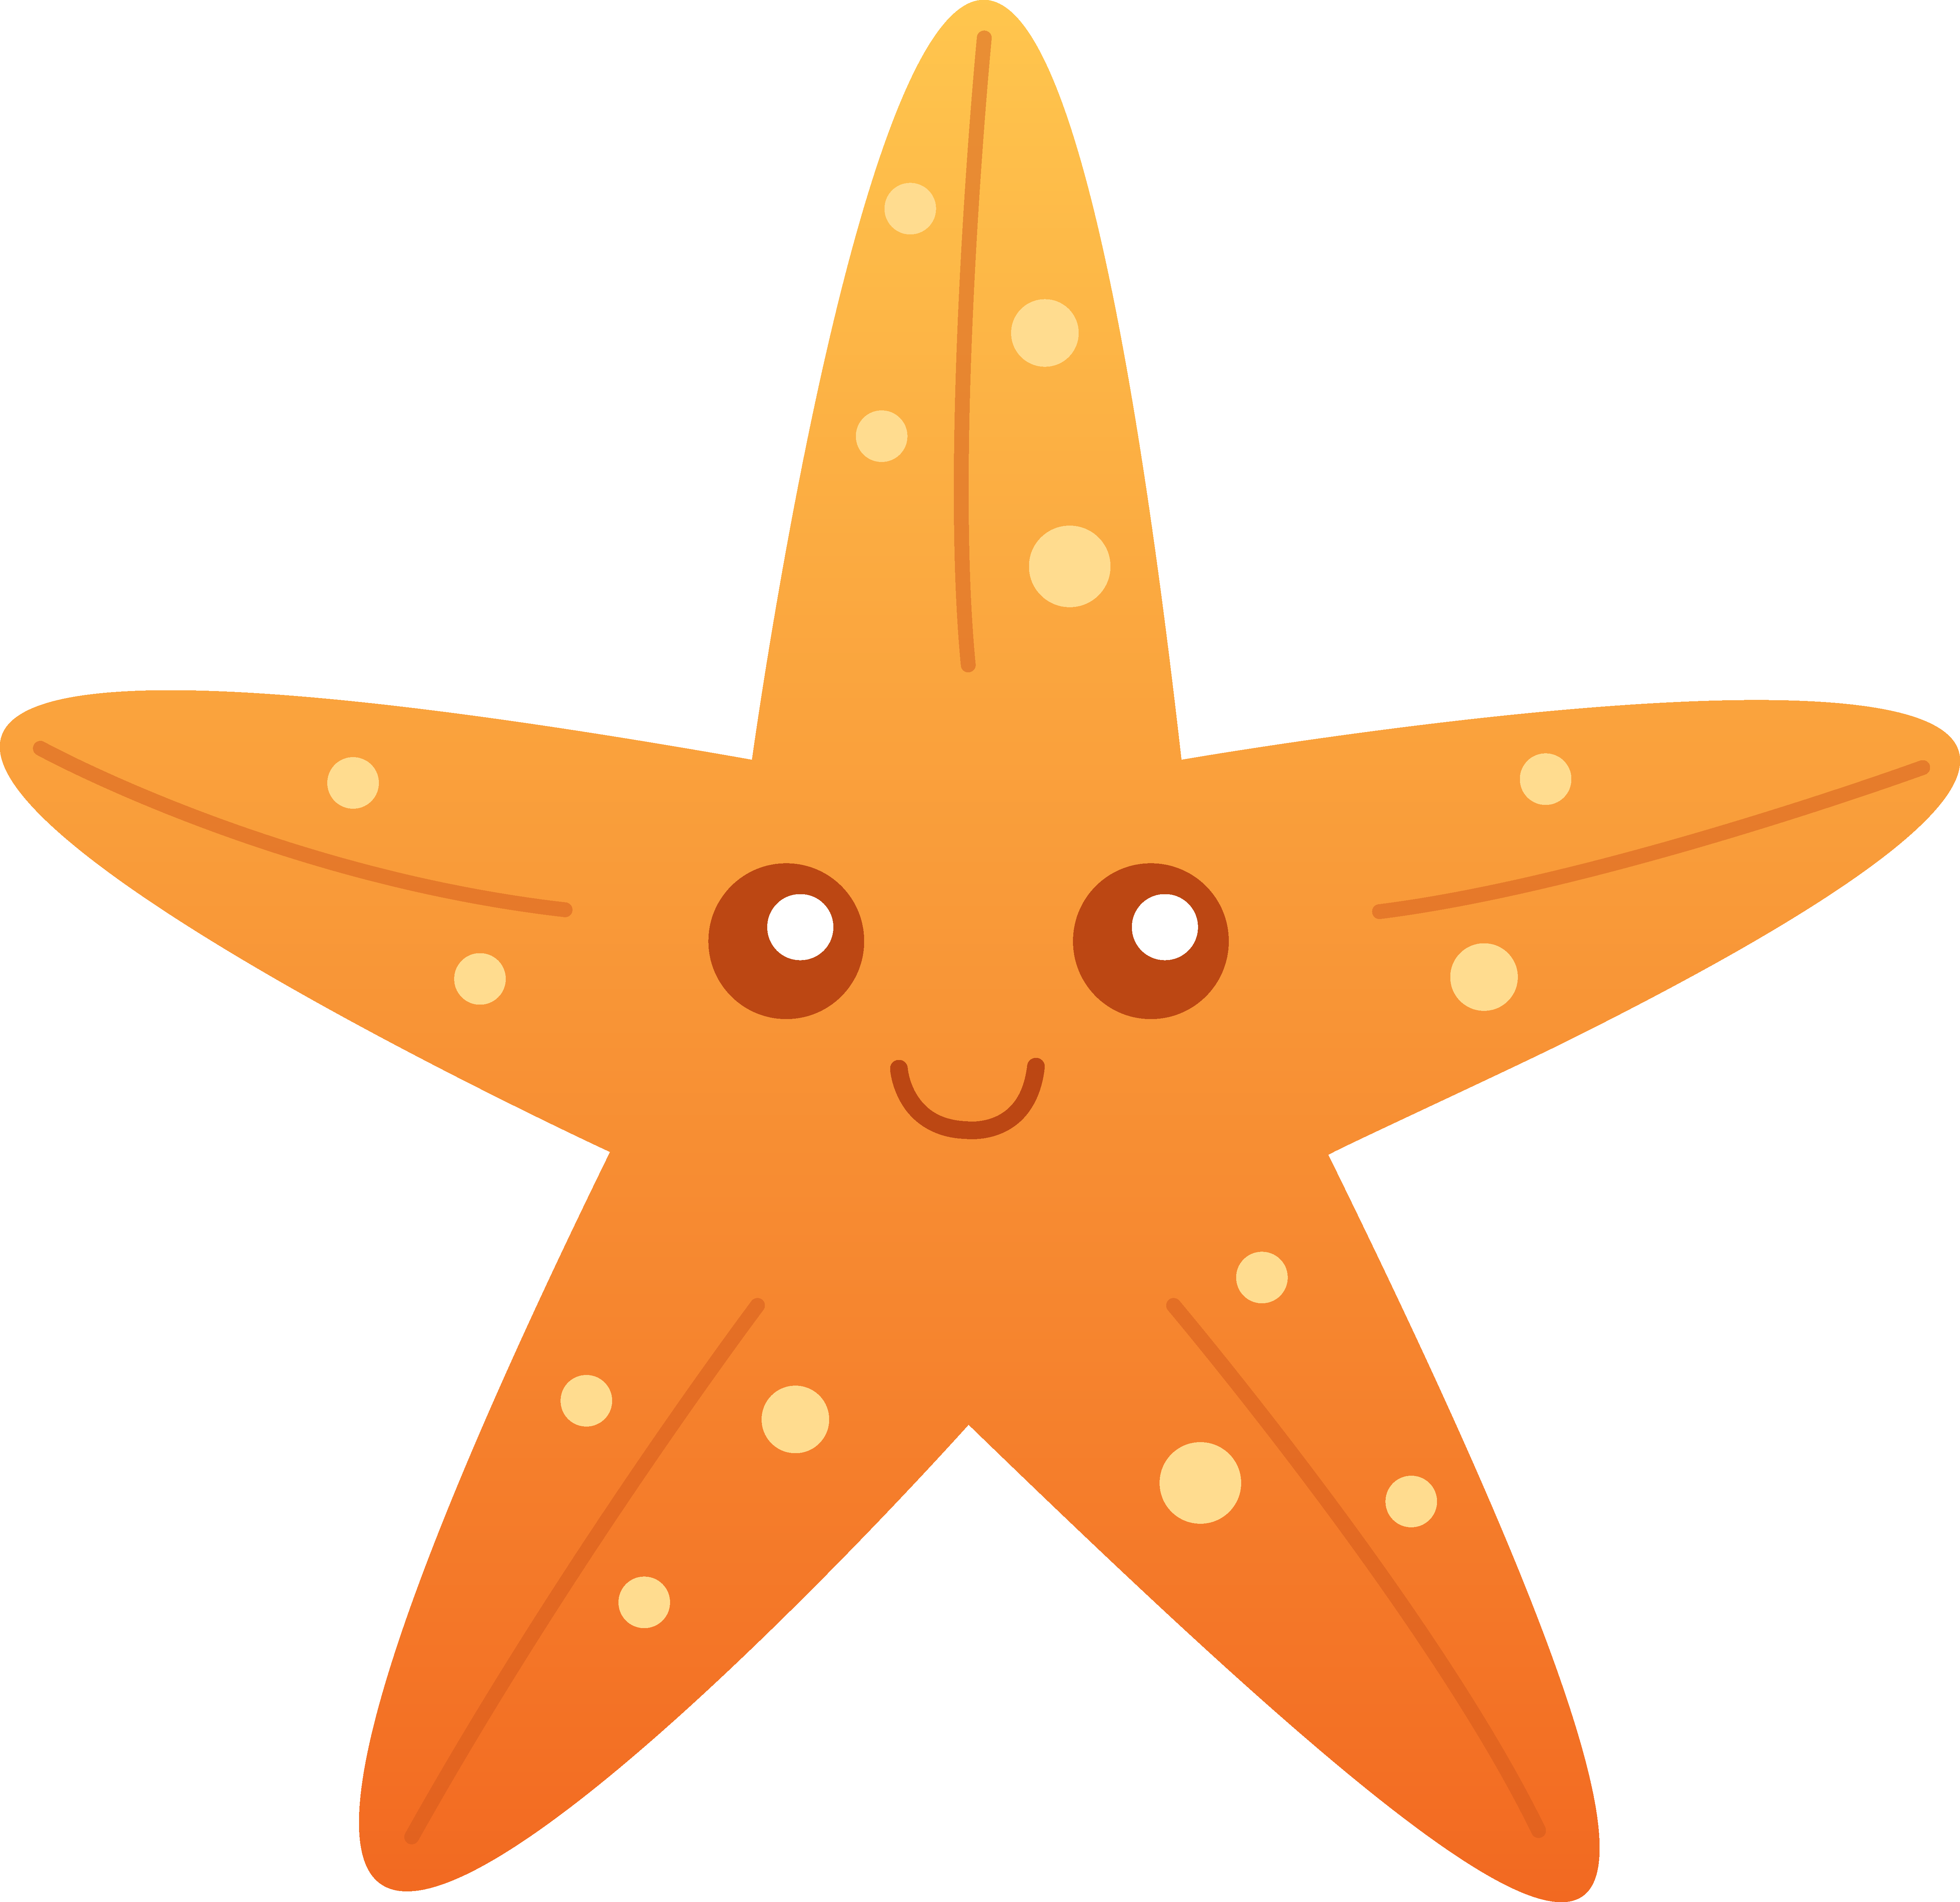 Ocean star clipart vector transparent download Free Ocean Starfish Cliparts, Download Free Clip Art, Free Clip Art ... vector transparent download